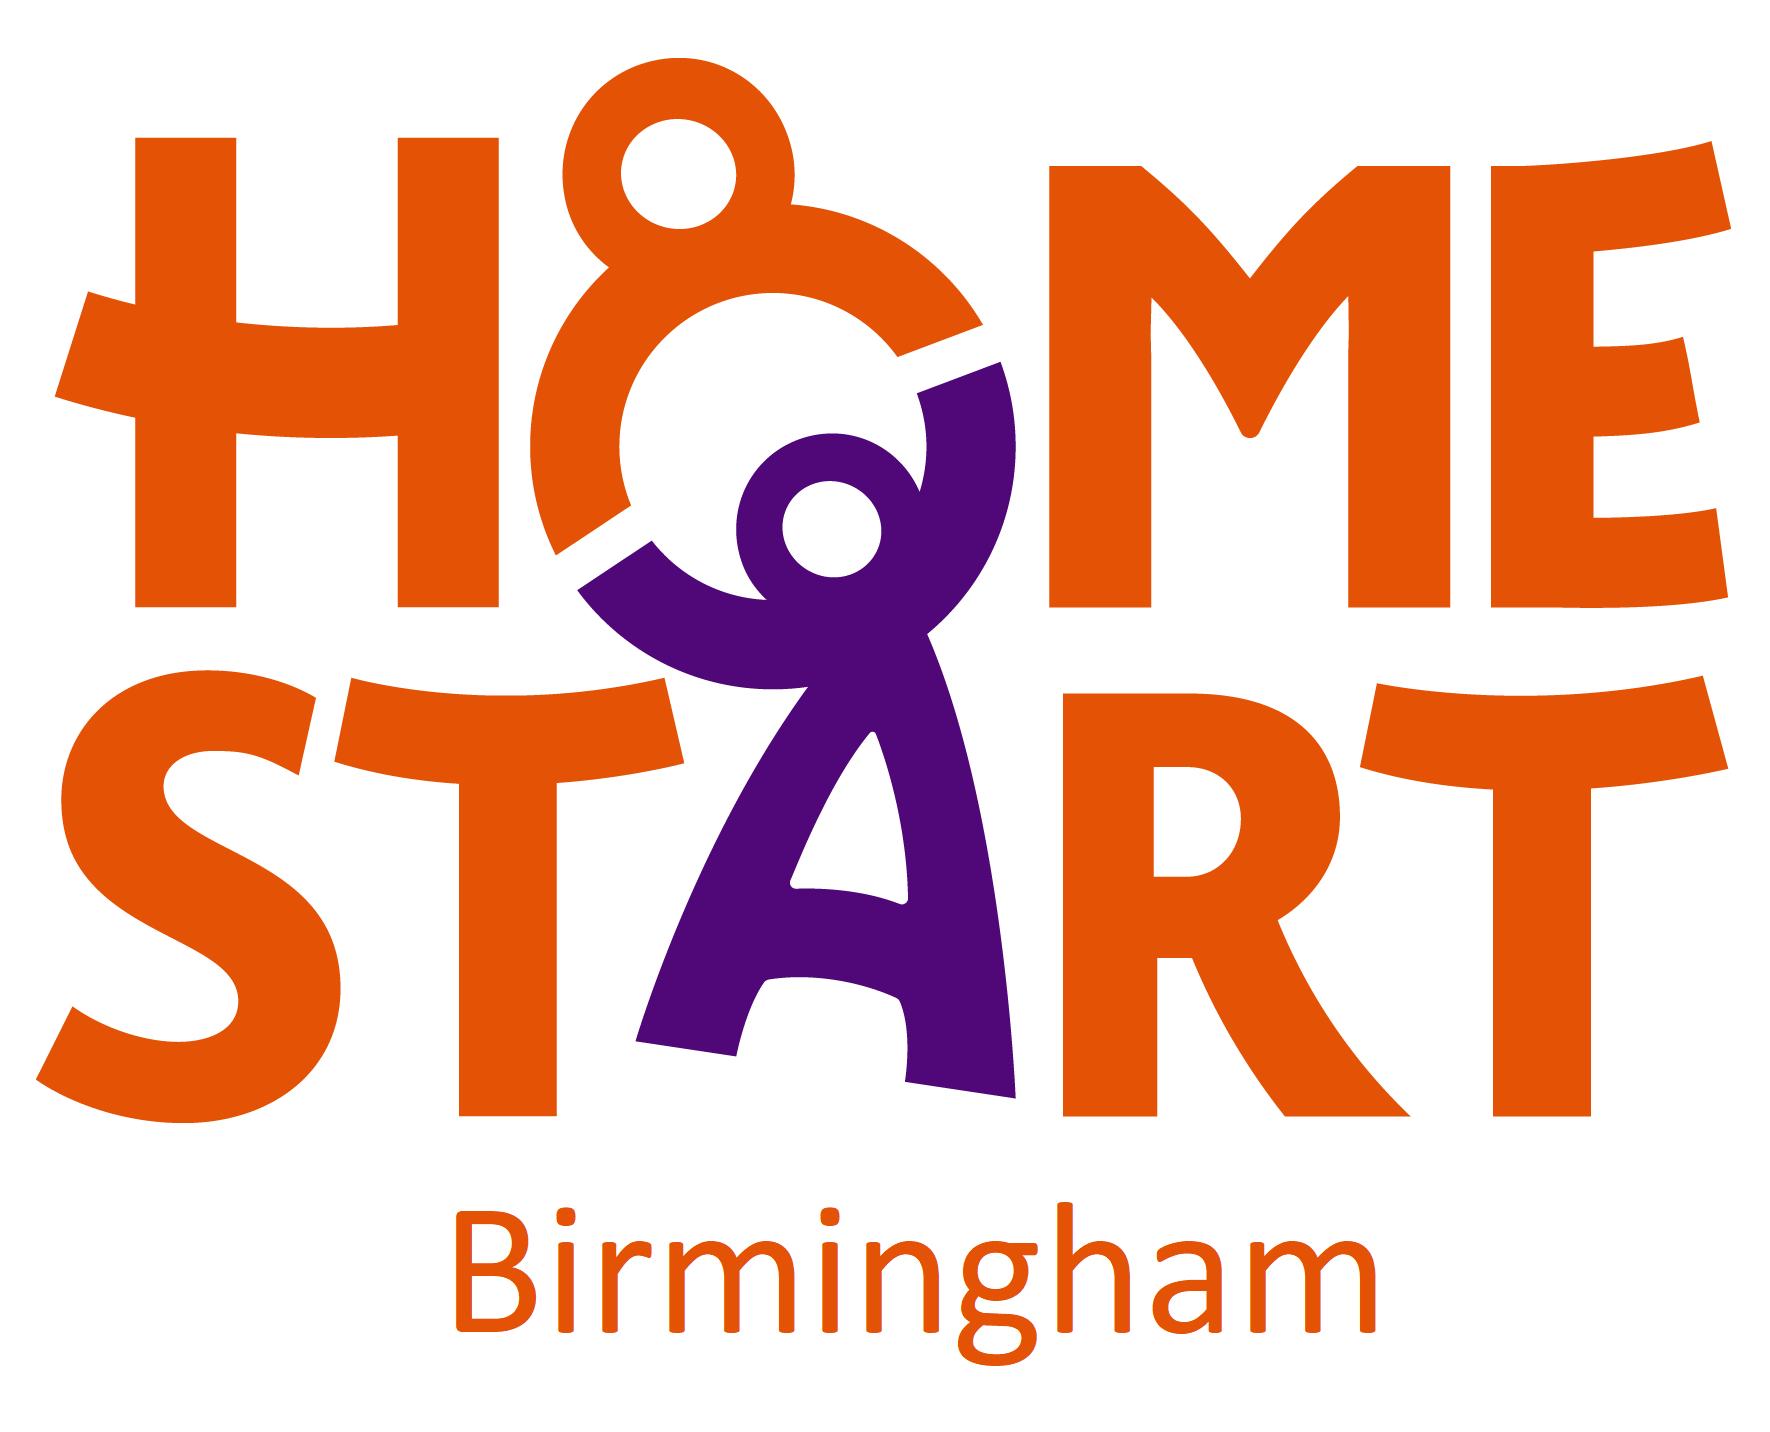 Home-Start Birmingham